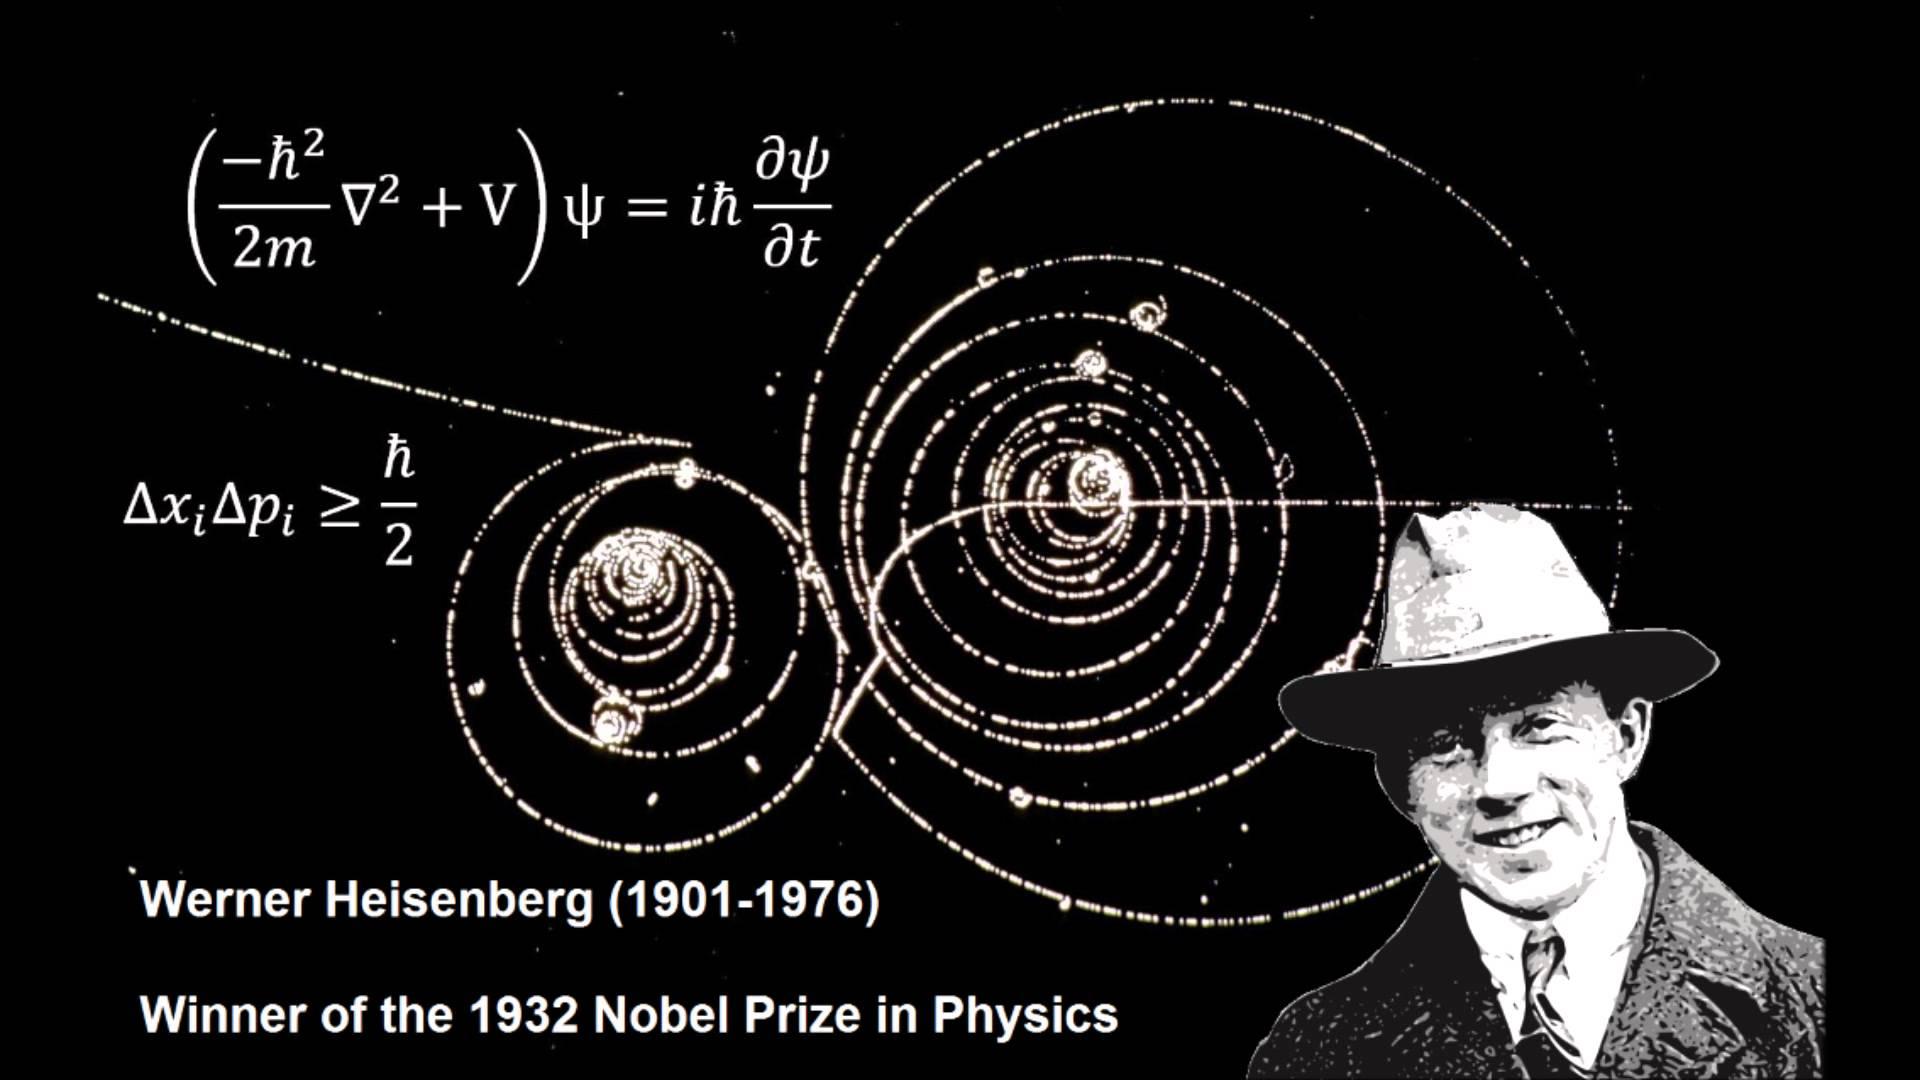 schrodinger equation and Heisenberg's inequality principle